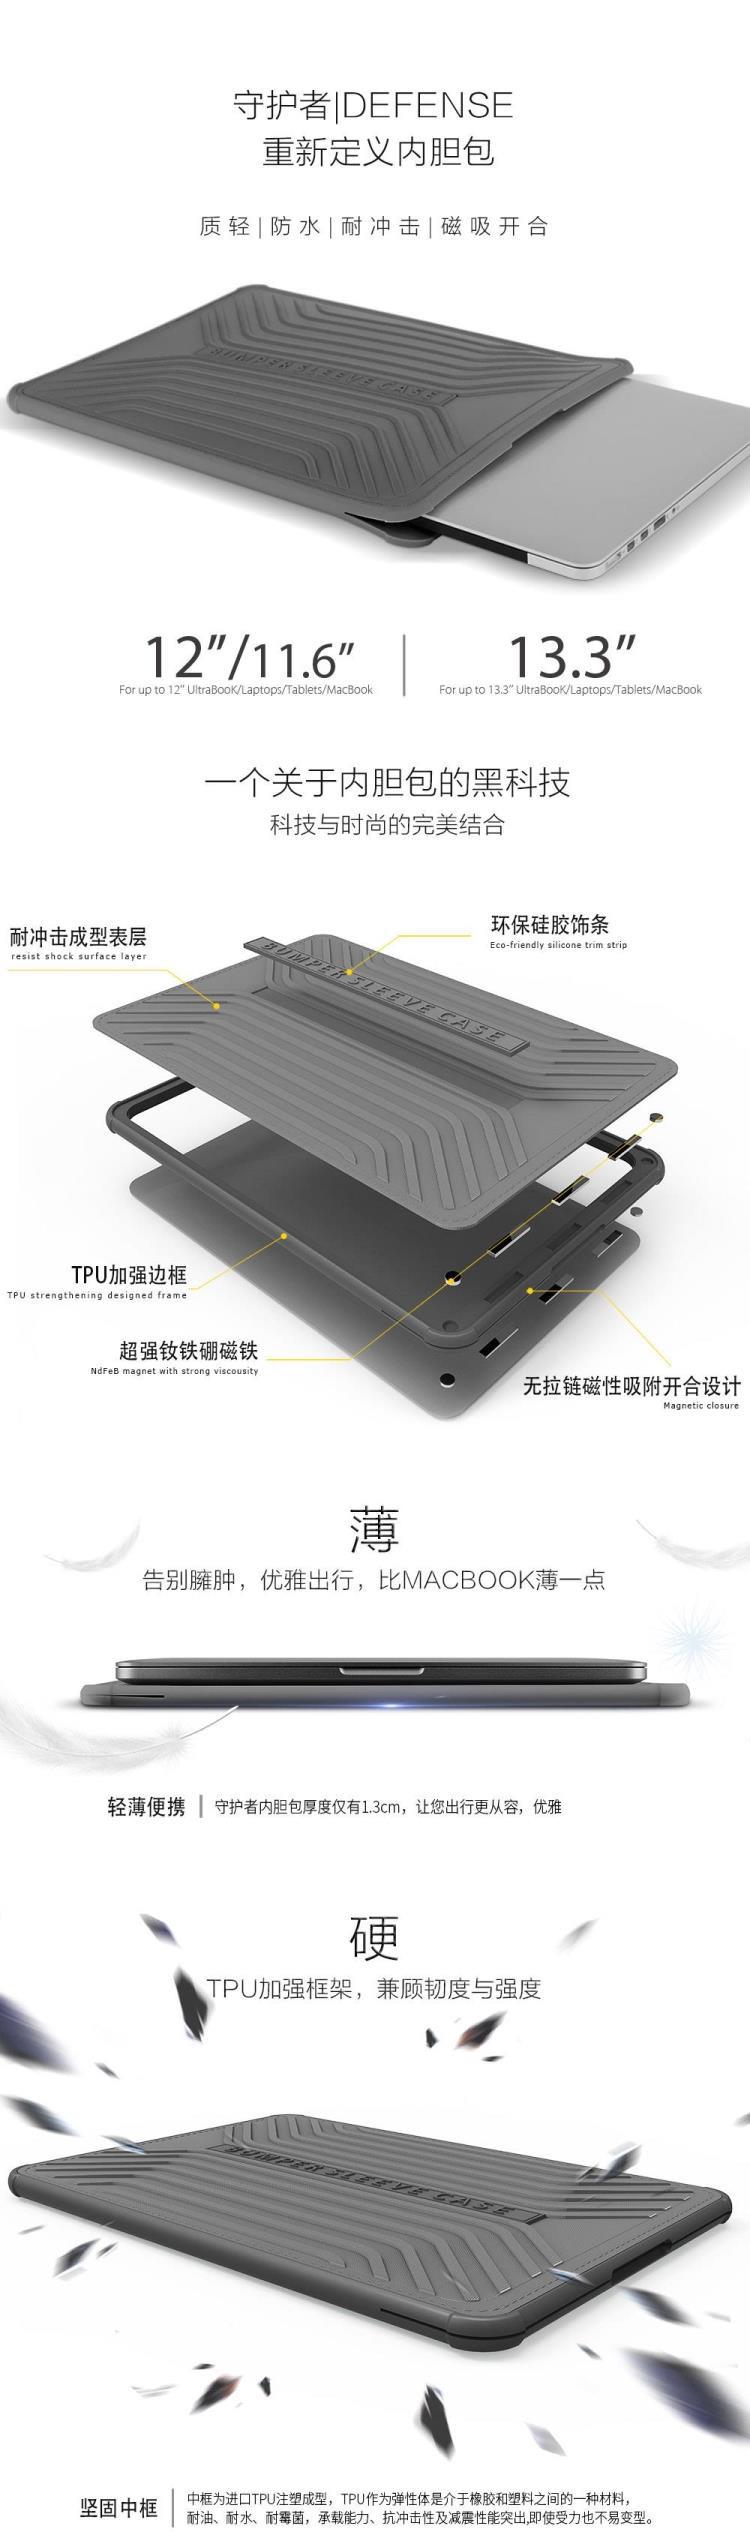 WIWU 守护者内胆包苹果笔记本电脑内胆包MacBook Air 13.3英寸/iPad保护套防摔套